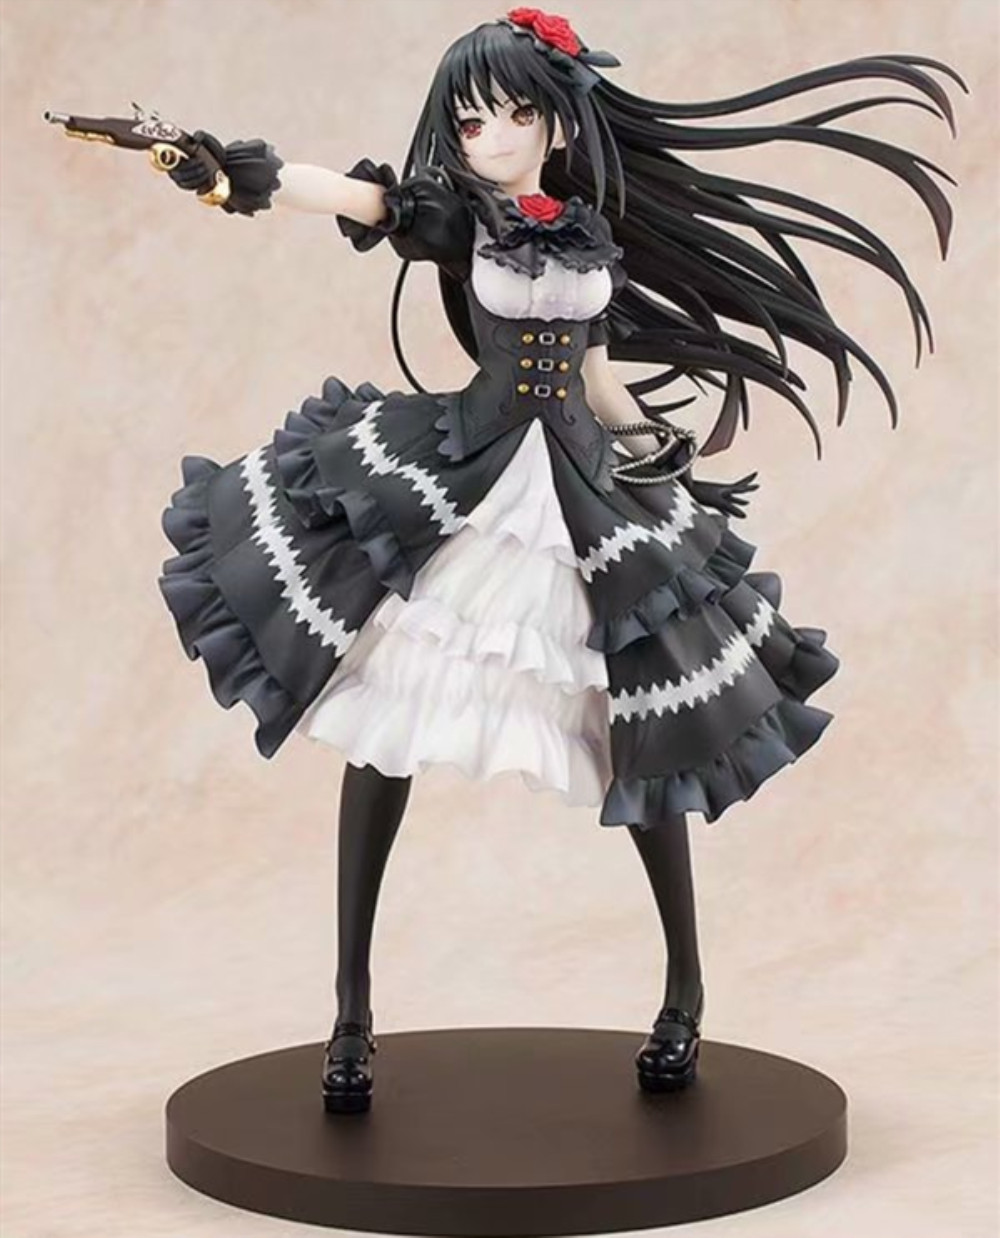 Anime Date A Live Nightmare Tokisaki Kurumi Action Figure Fantasia 30th Anniversary Figurine PVC Model Doll Girl Gift Toys PM 1